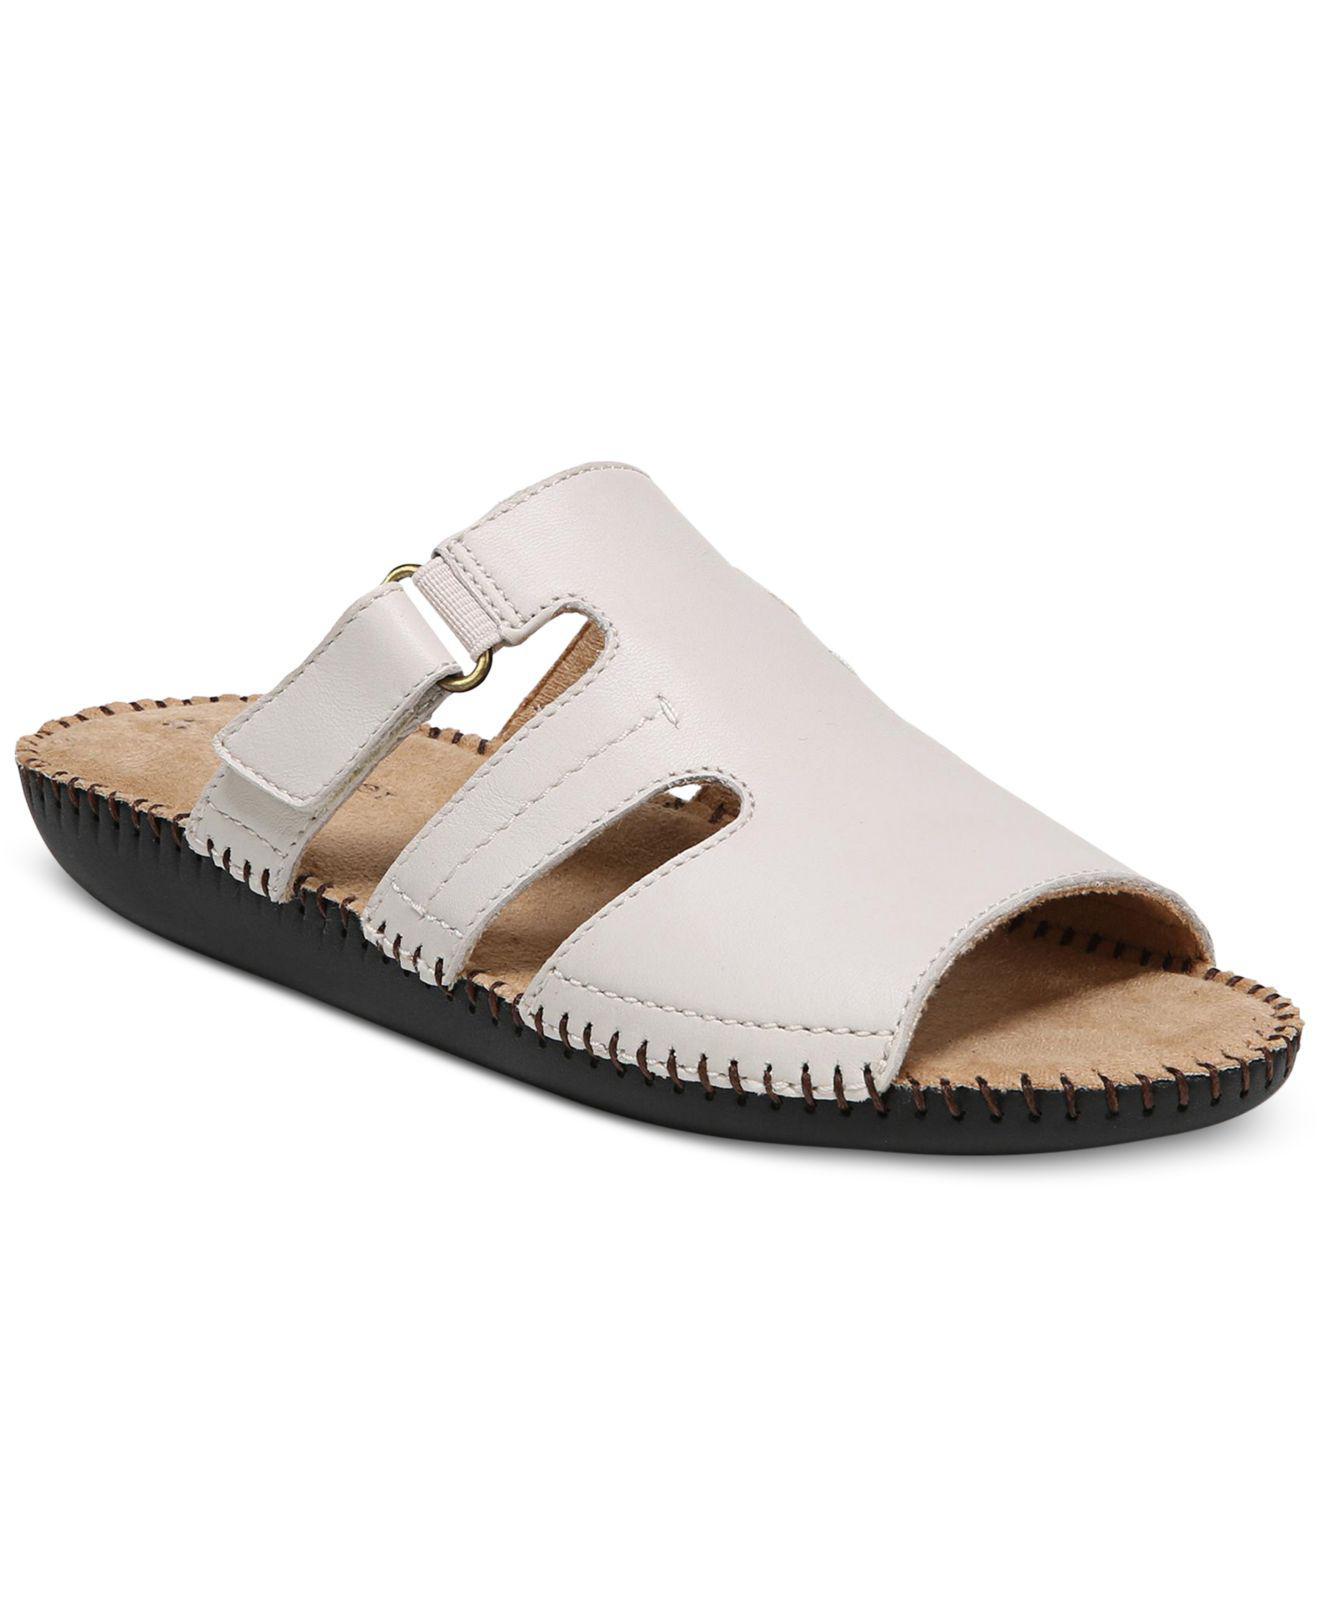 645cfeea280 Lyst - Naturalizer Serene Flat Sandals in Natural